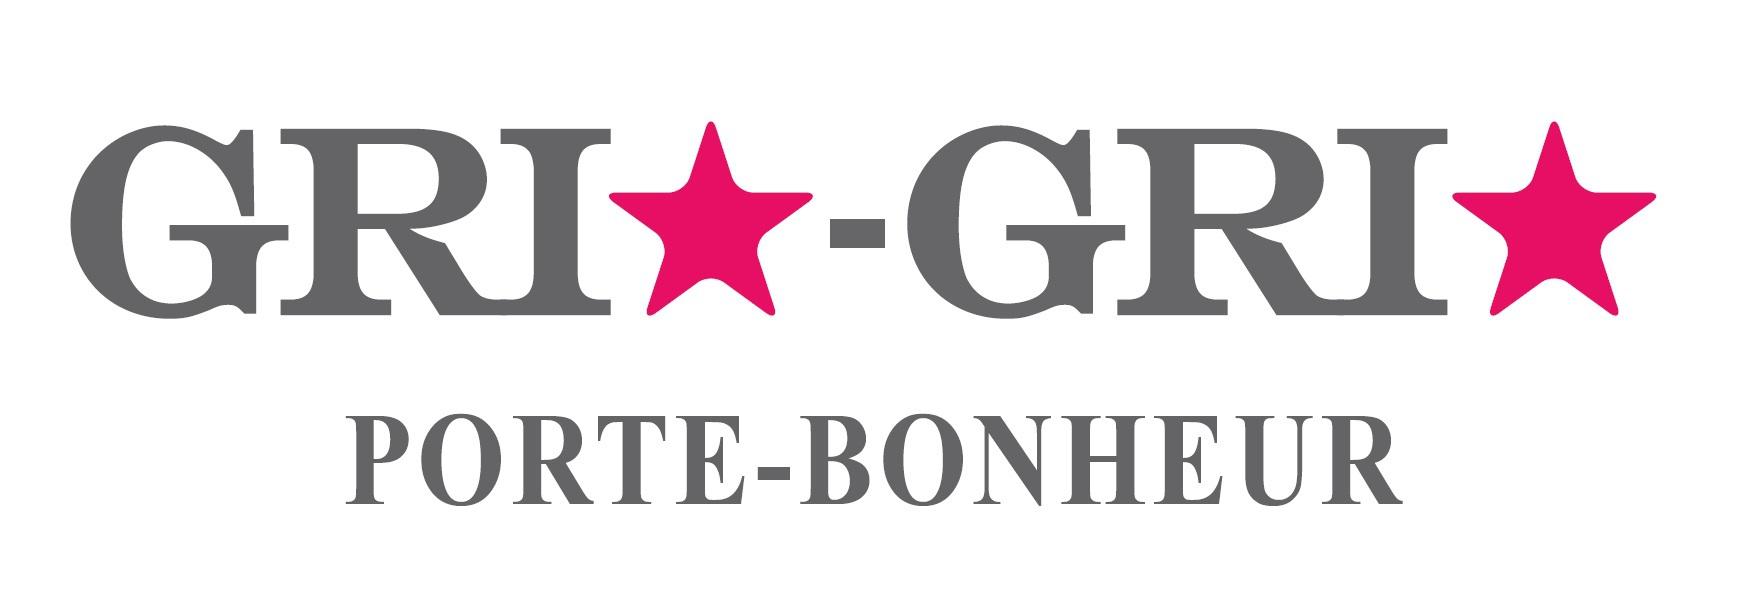 Bildmarke: GRI*-GRI* PORTE-BONHEUR